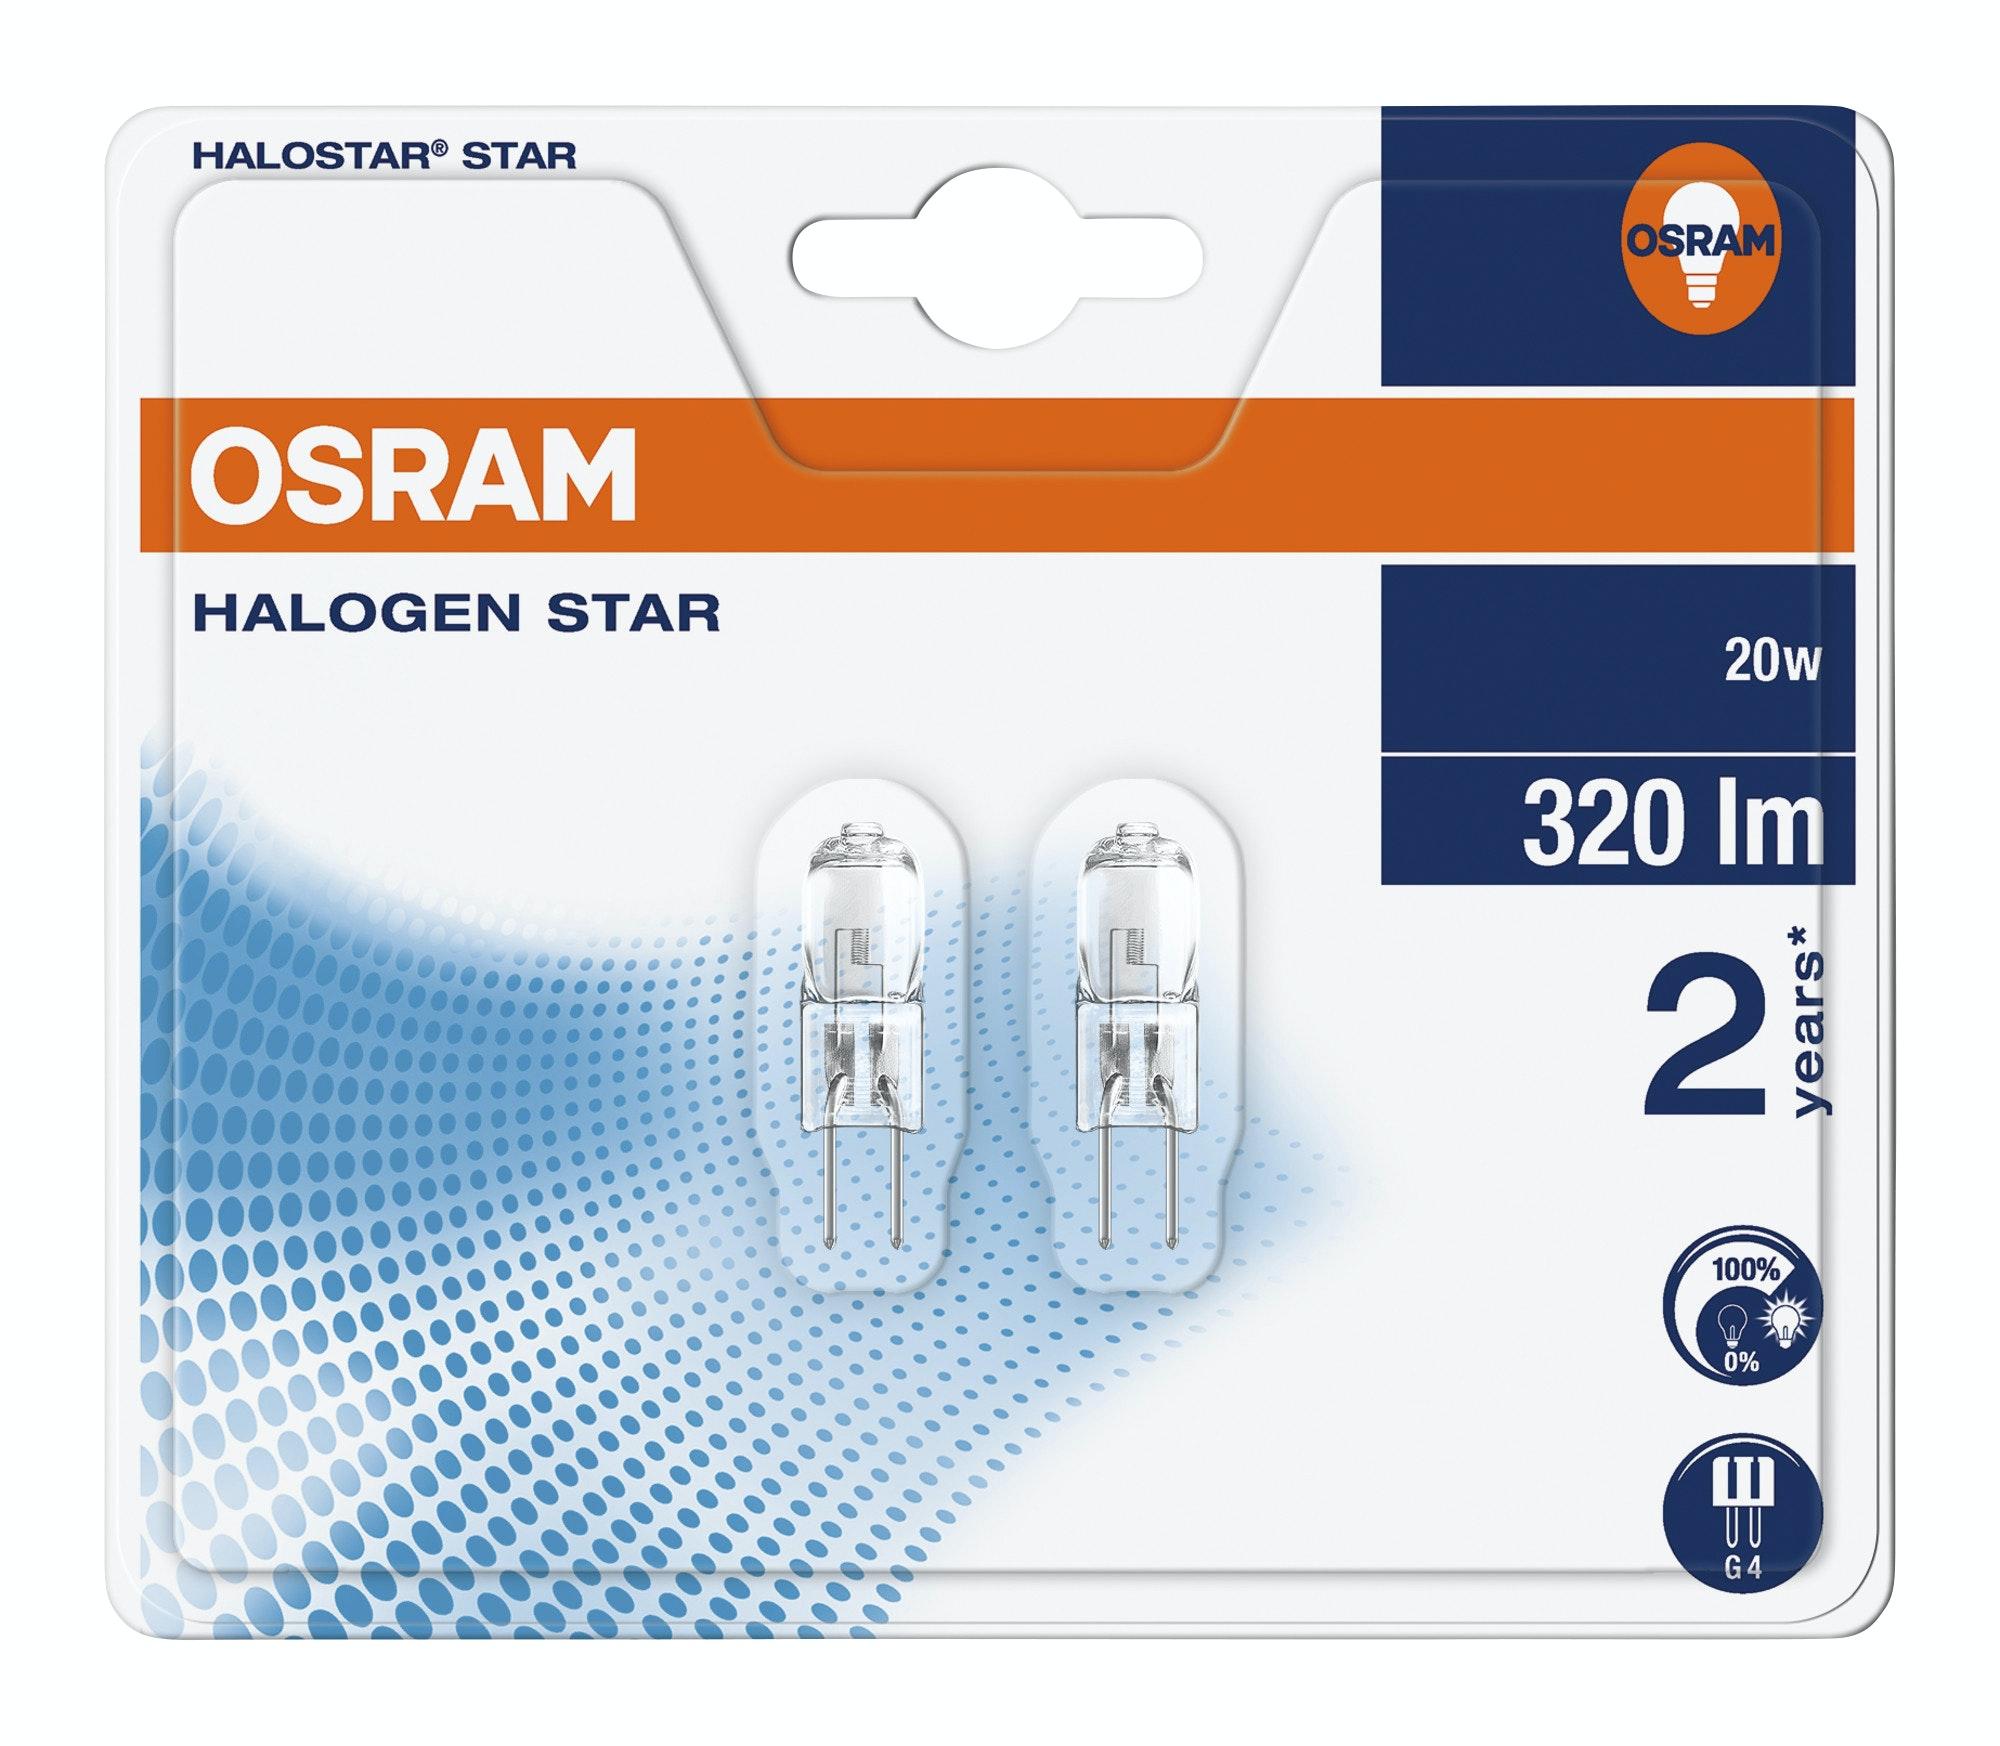 Halogenlampa Osram Star 20W G4 Clear 2-Pack